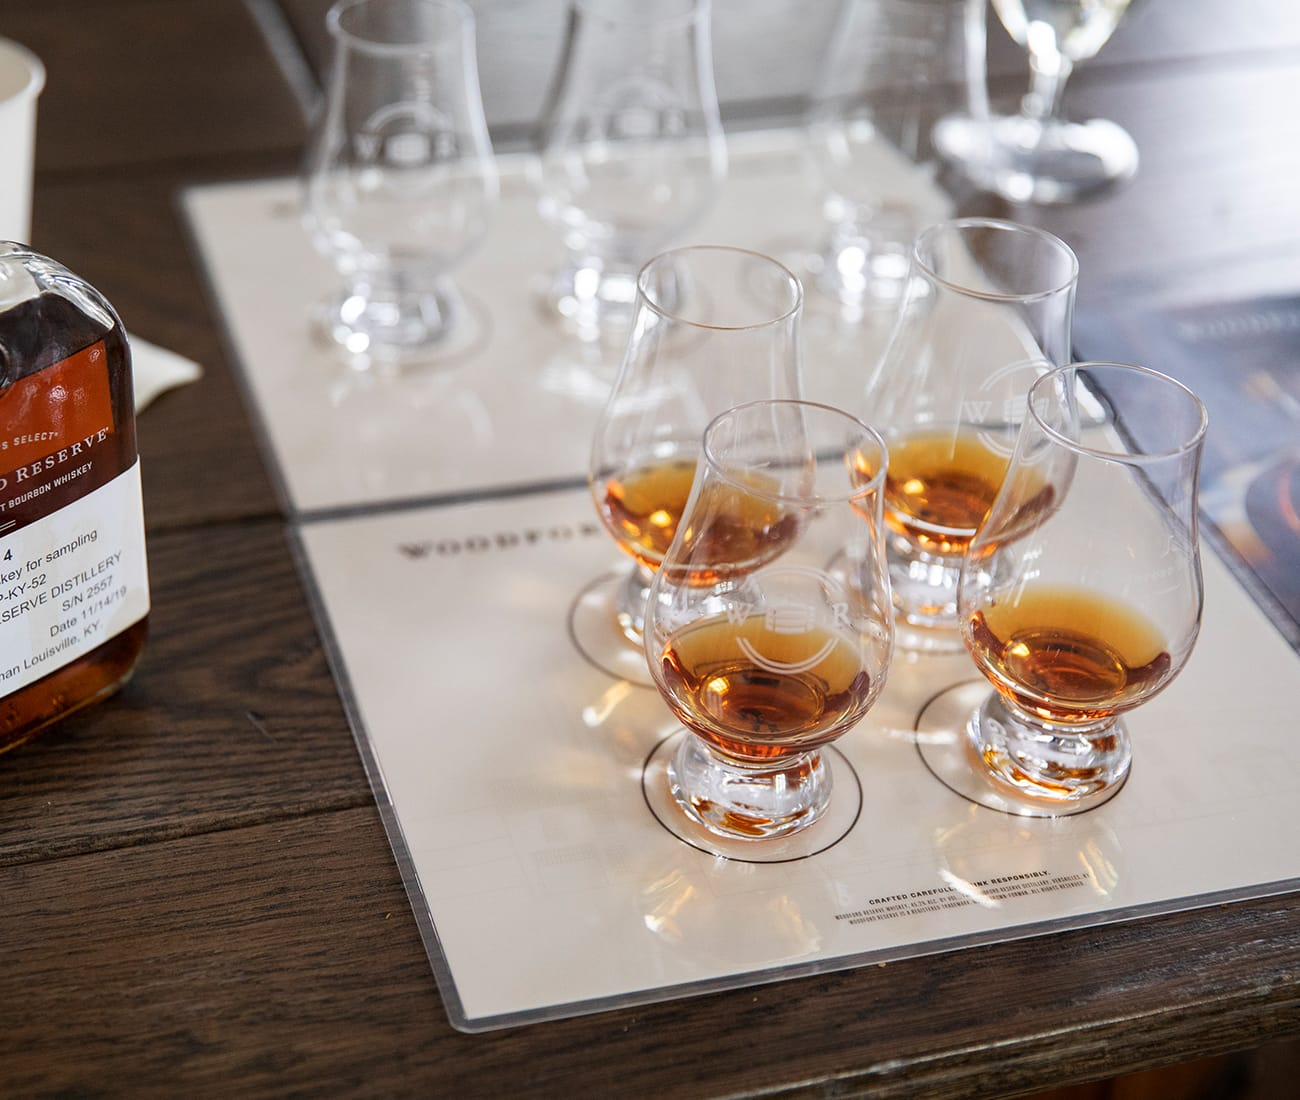 Image for Host a whiskey tasting